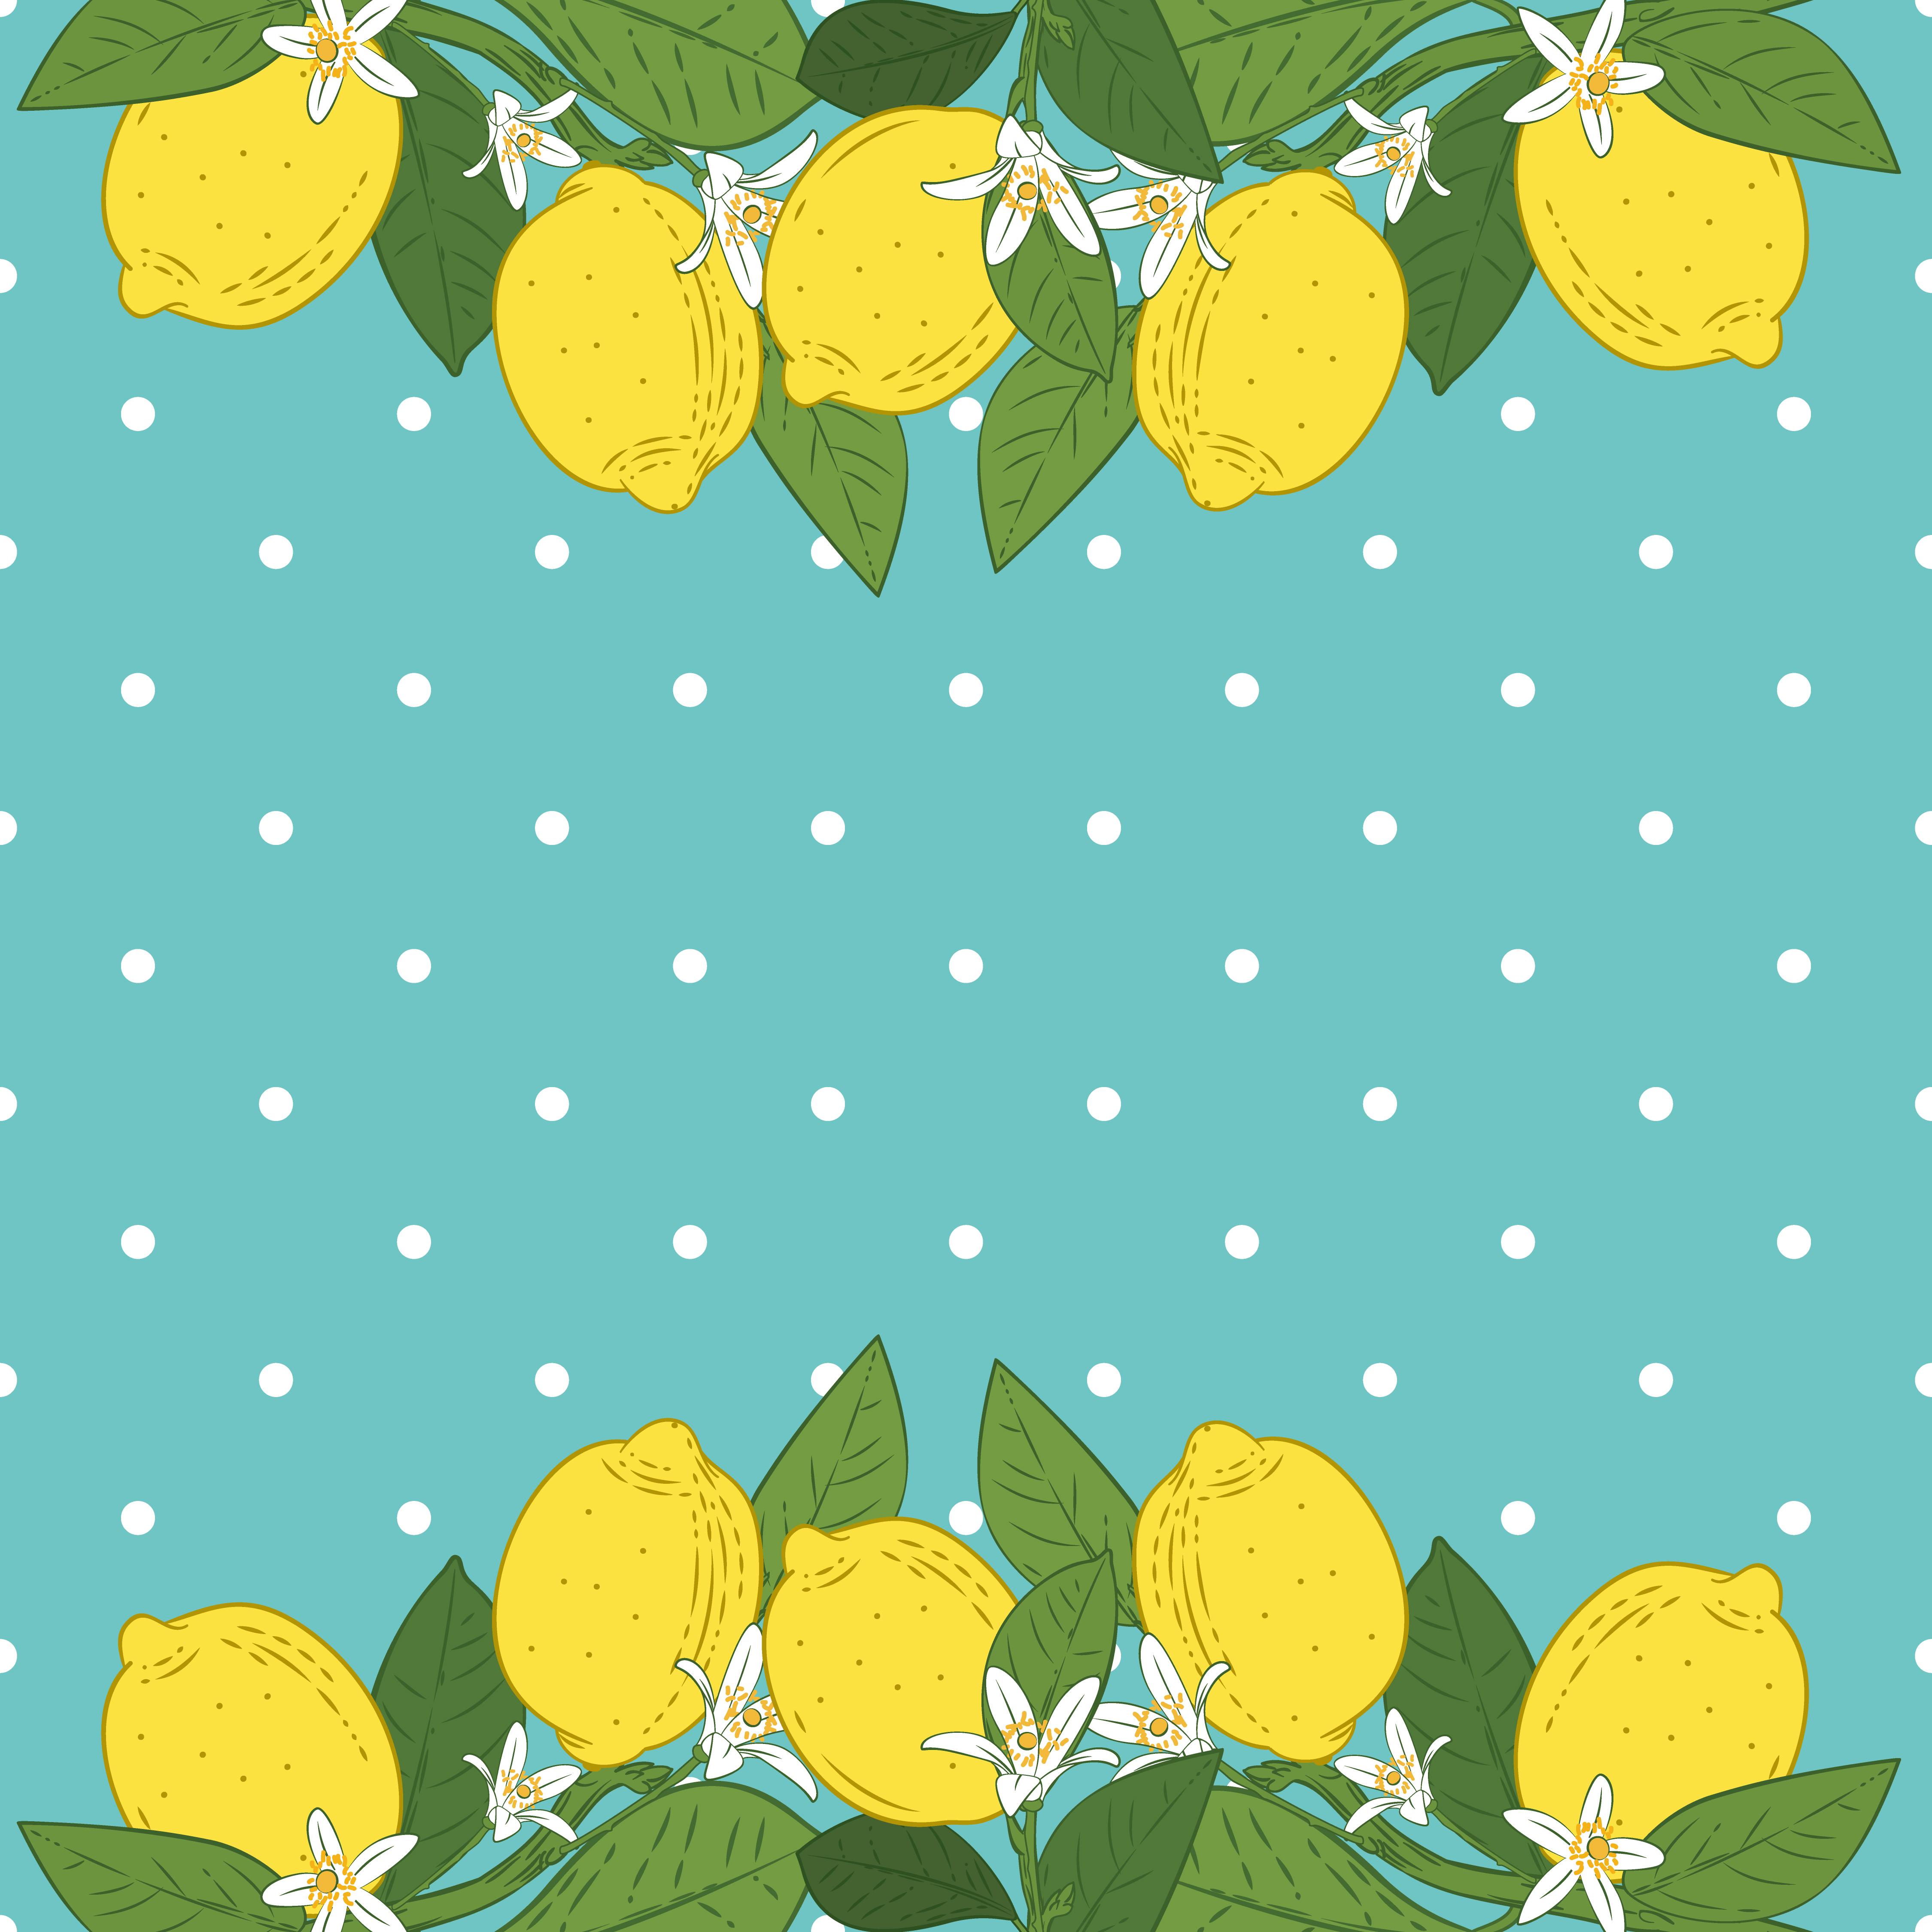 Tropical Citrus Lemon Fruits Bright Background. Poster